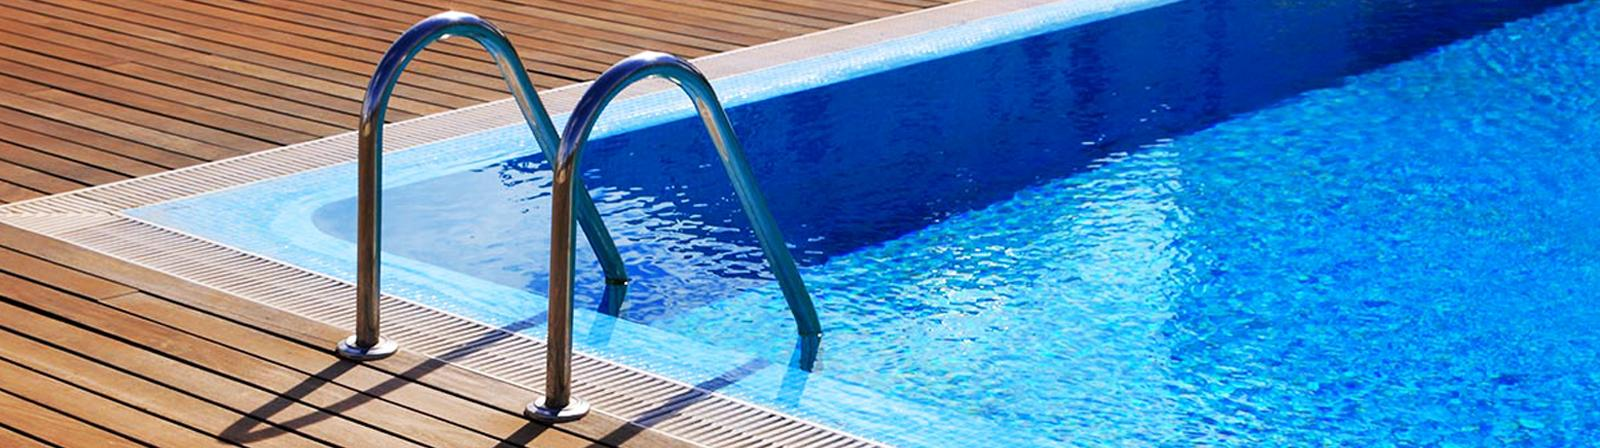 Escalera baranda pasamanos acero inoxidable piscina agua - Piscina acero inoxidable ...